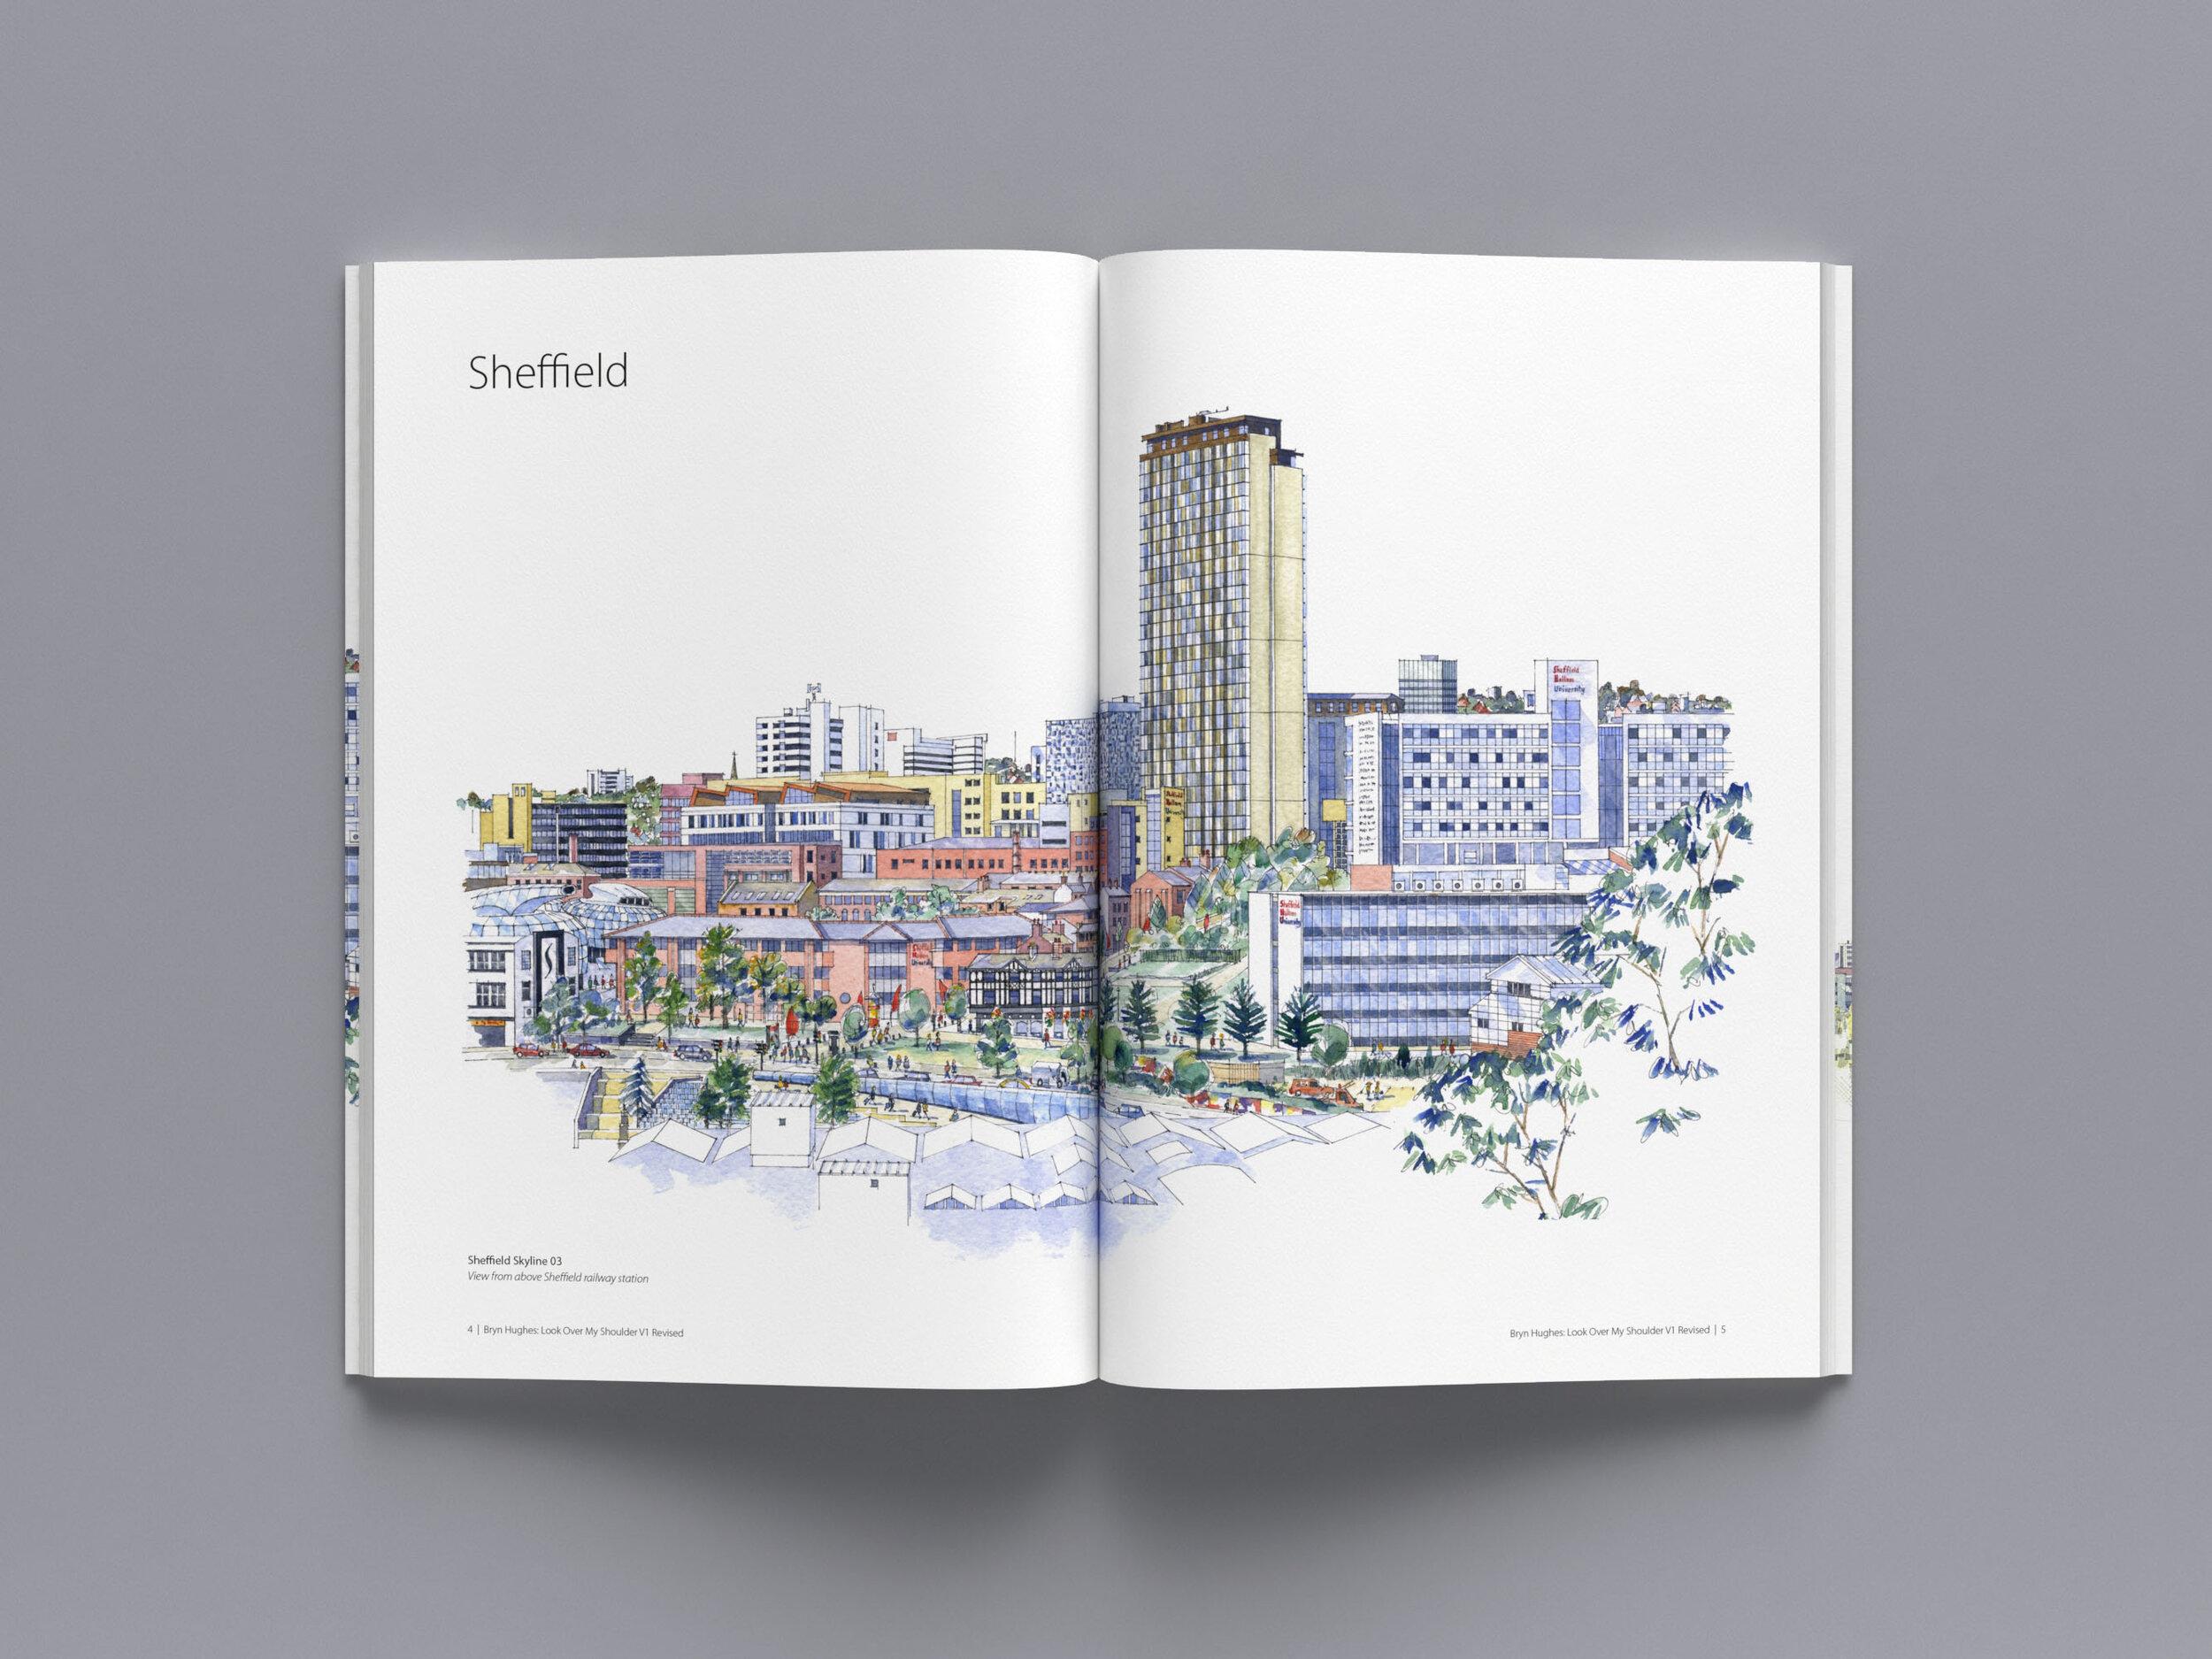 BRYN-HUGHES-ARTIST-SOFTBACK-BOOK02-B-_0039_Group 3.jpg